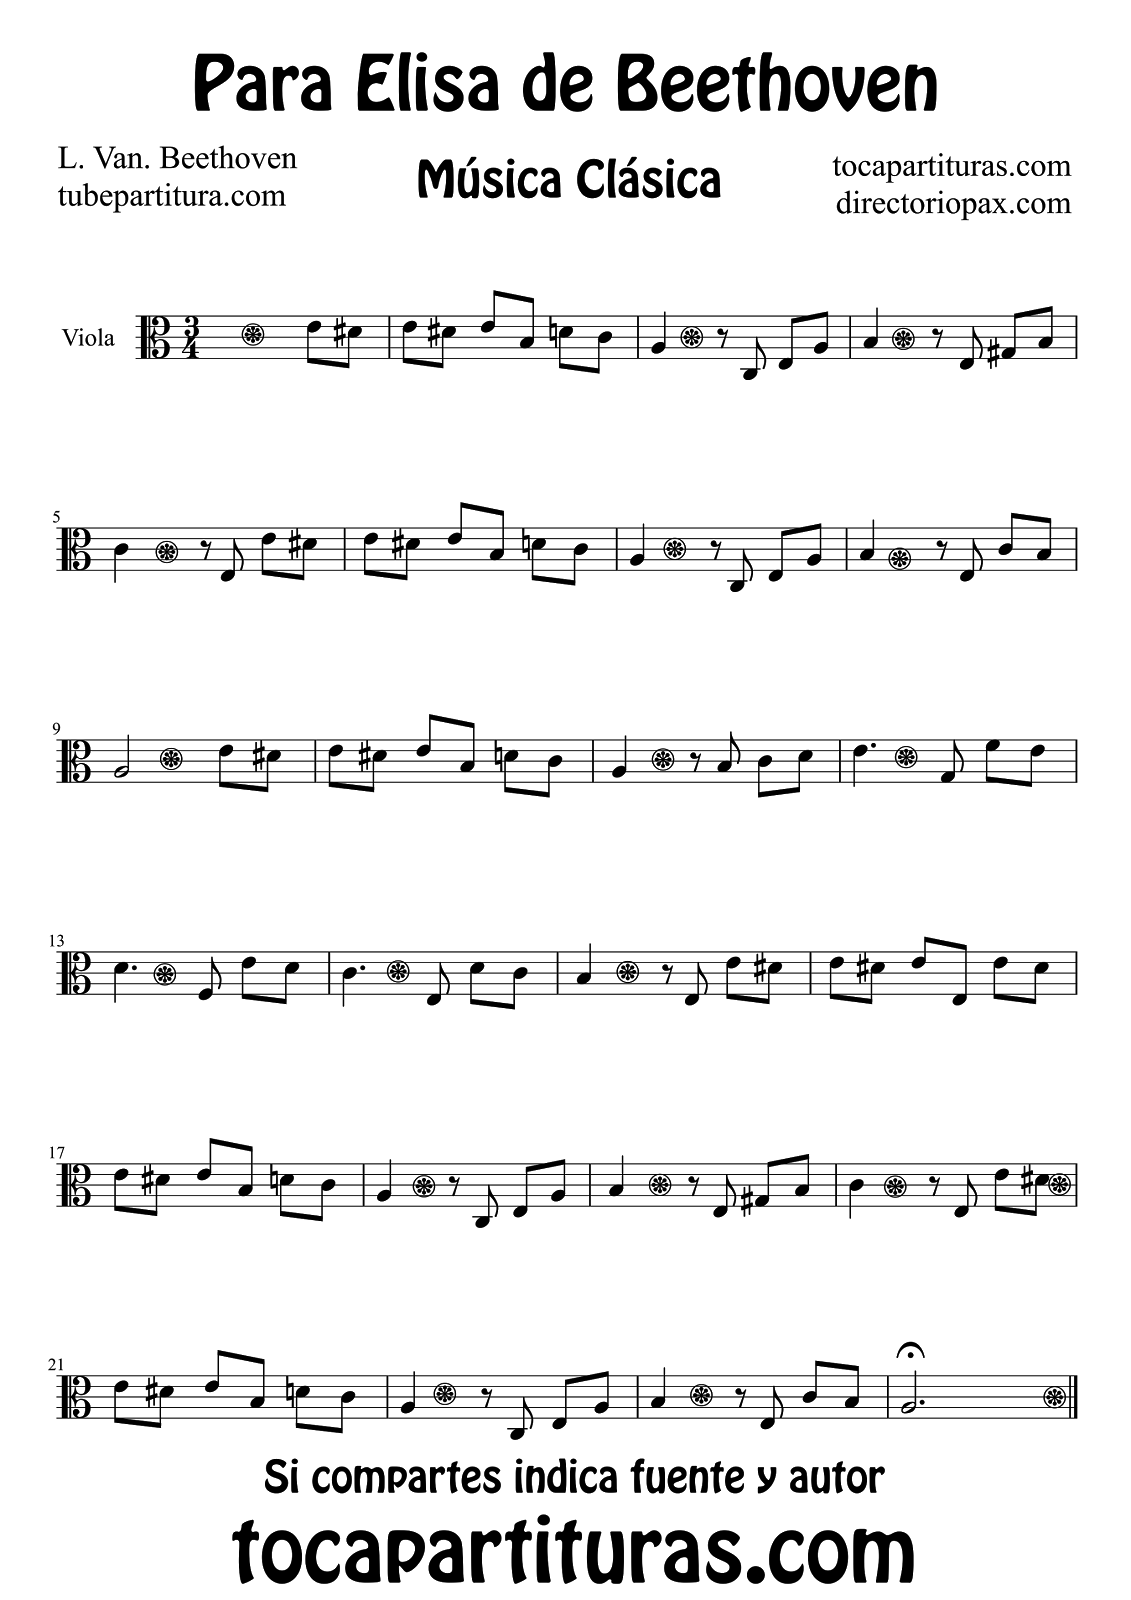 musica de beethoven para descargar